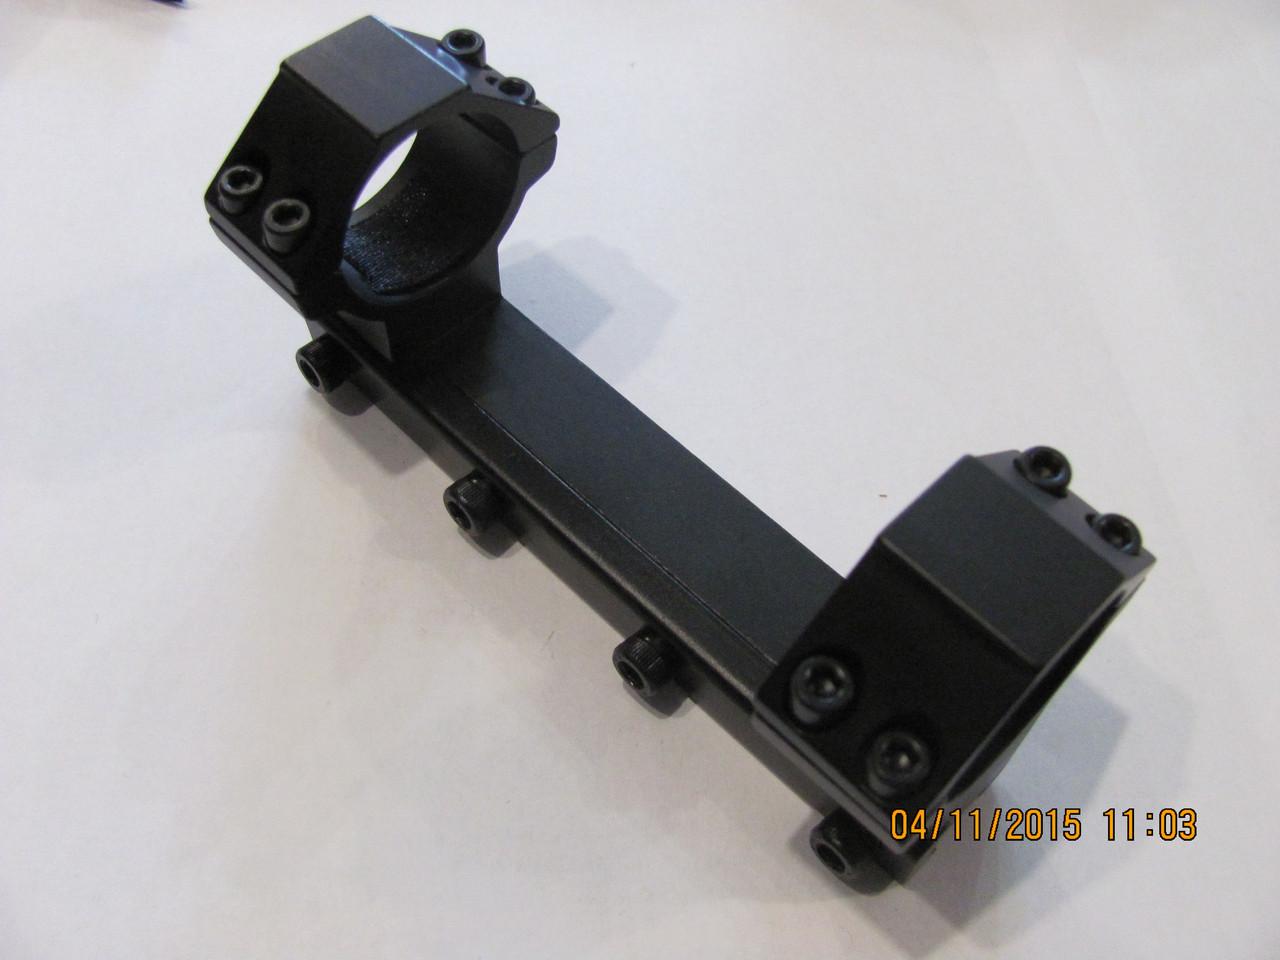 Моноблок для креплени оптики 30 мм , на ласточкин хвост